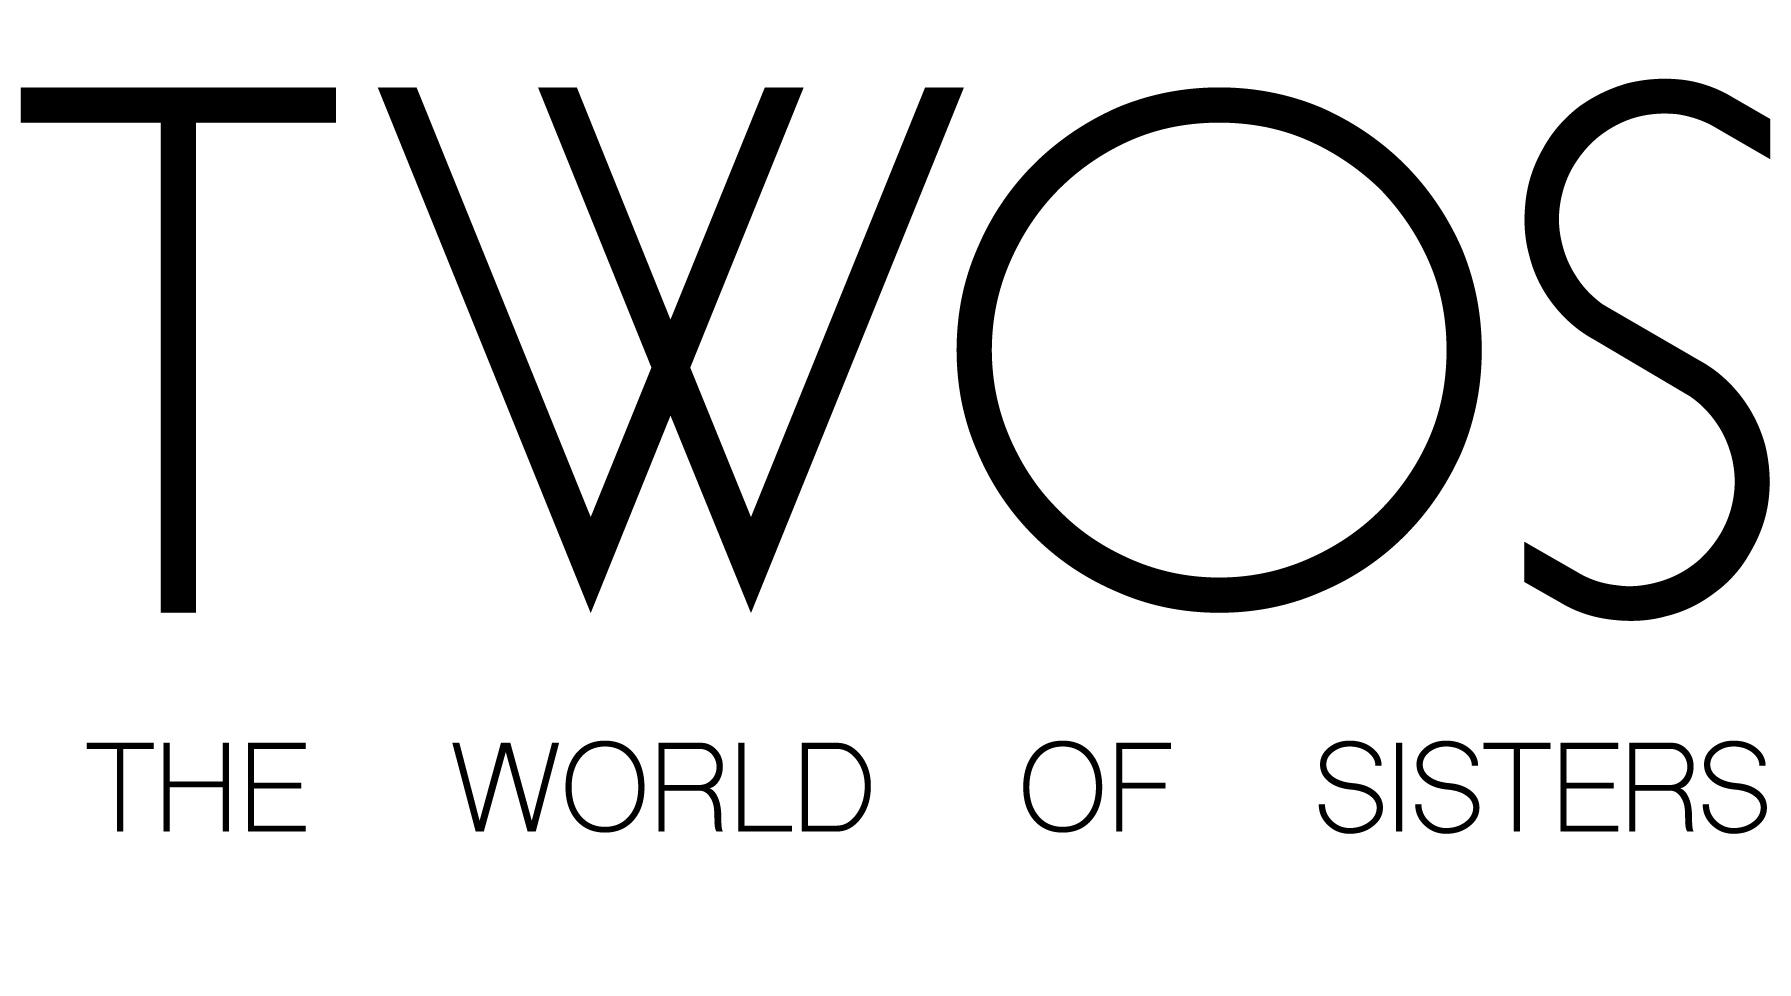 Theworldofsisters